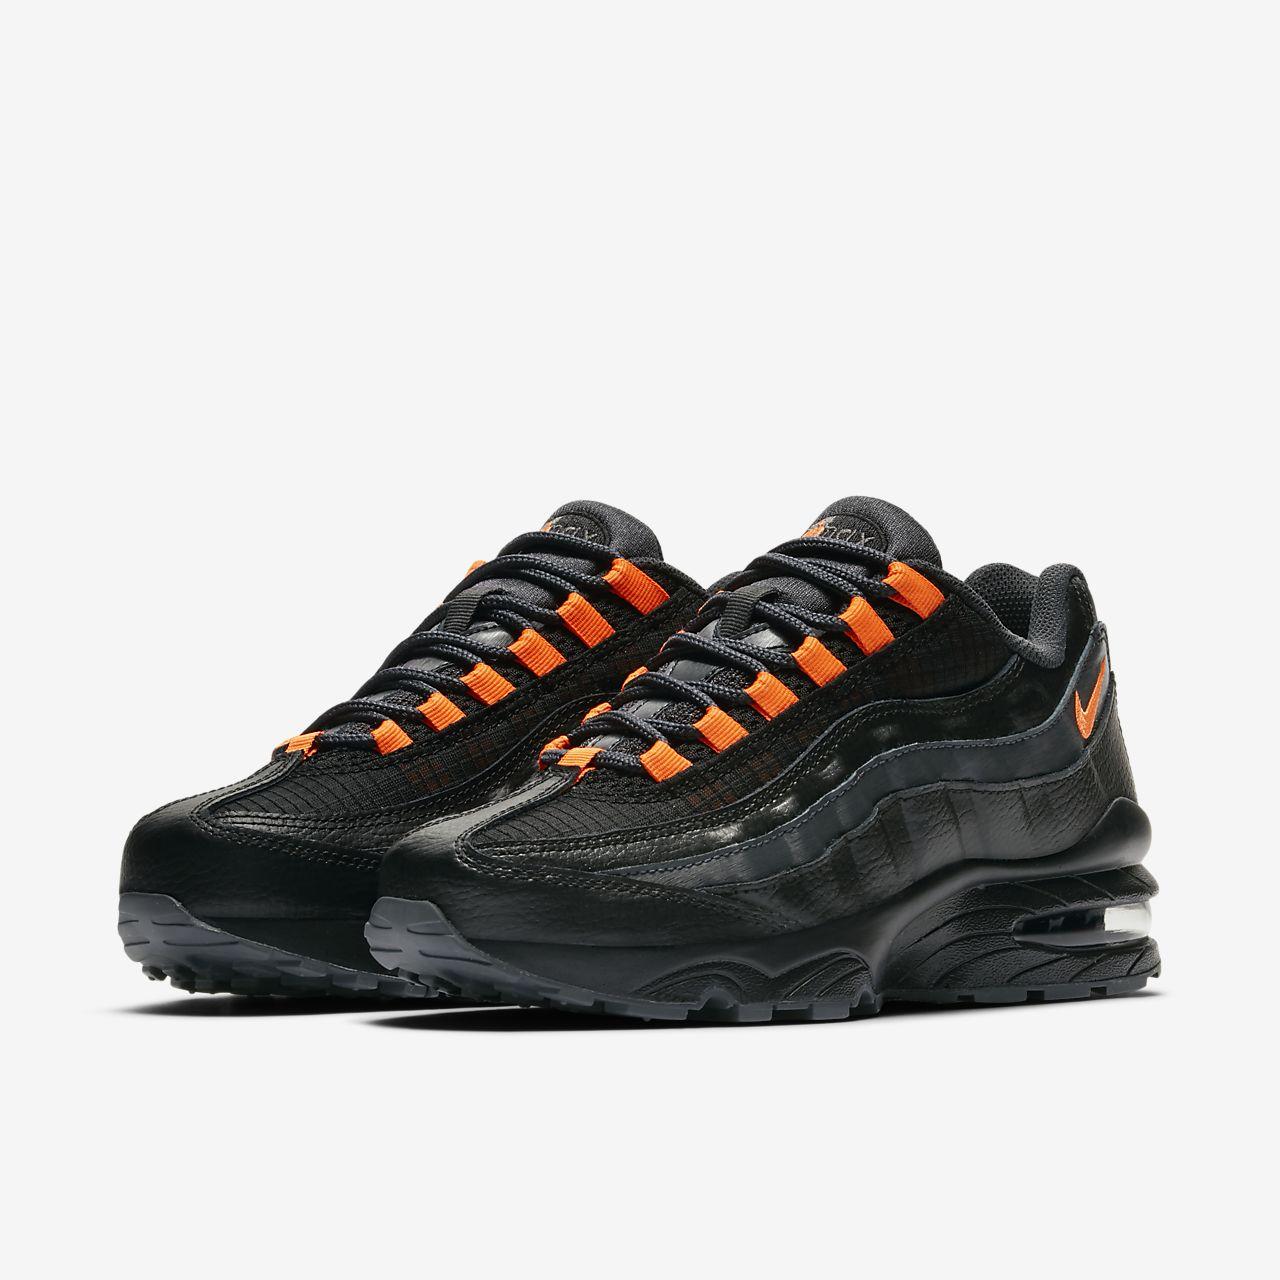 cheaper 13000 9f67b ... Nike Air Max 95 SE Older Kids  Shoe